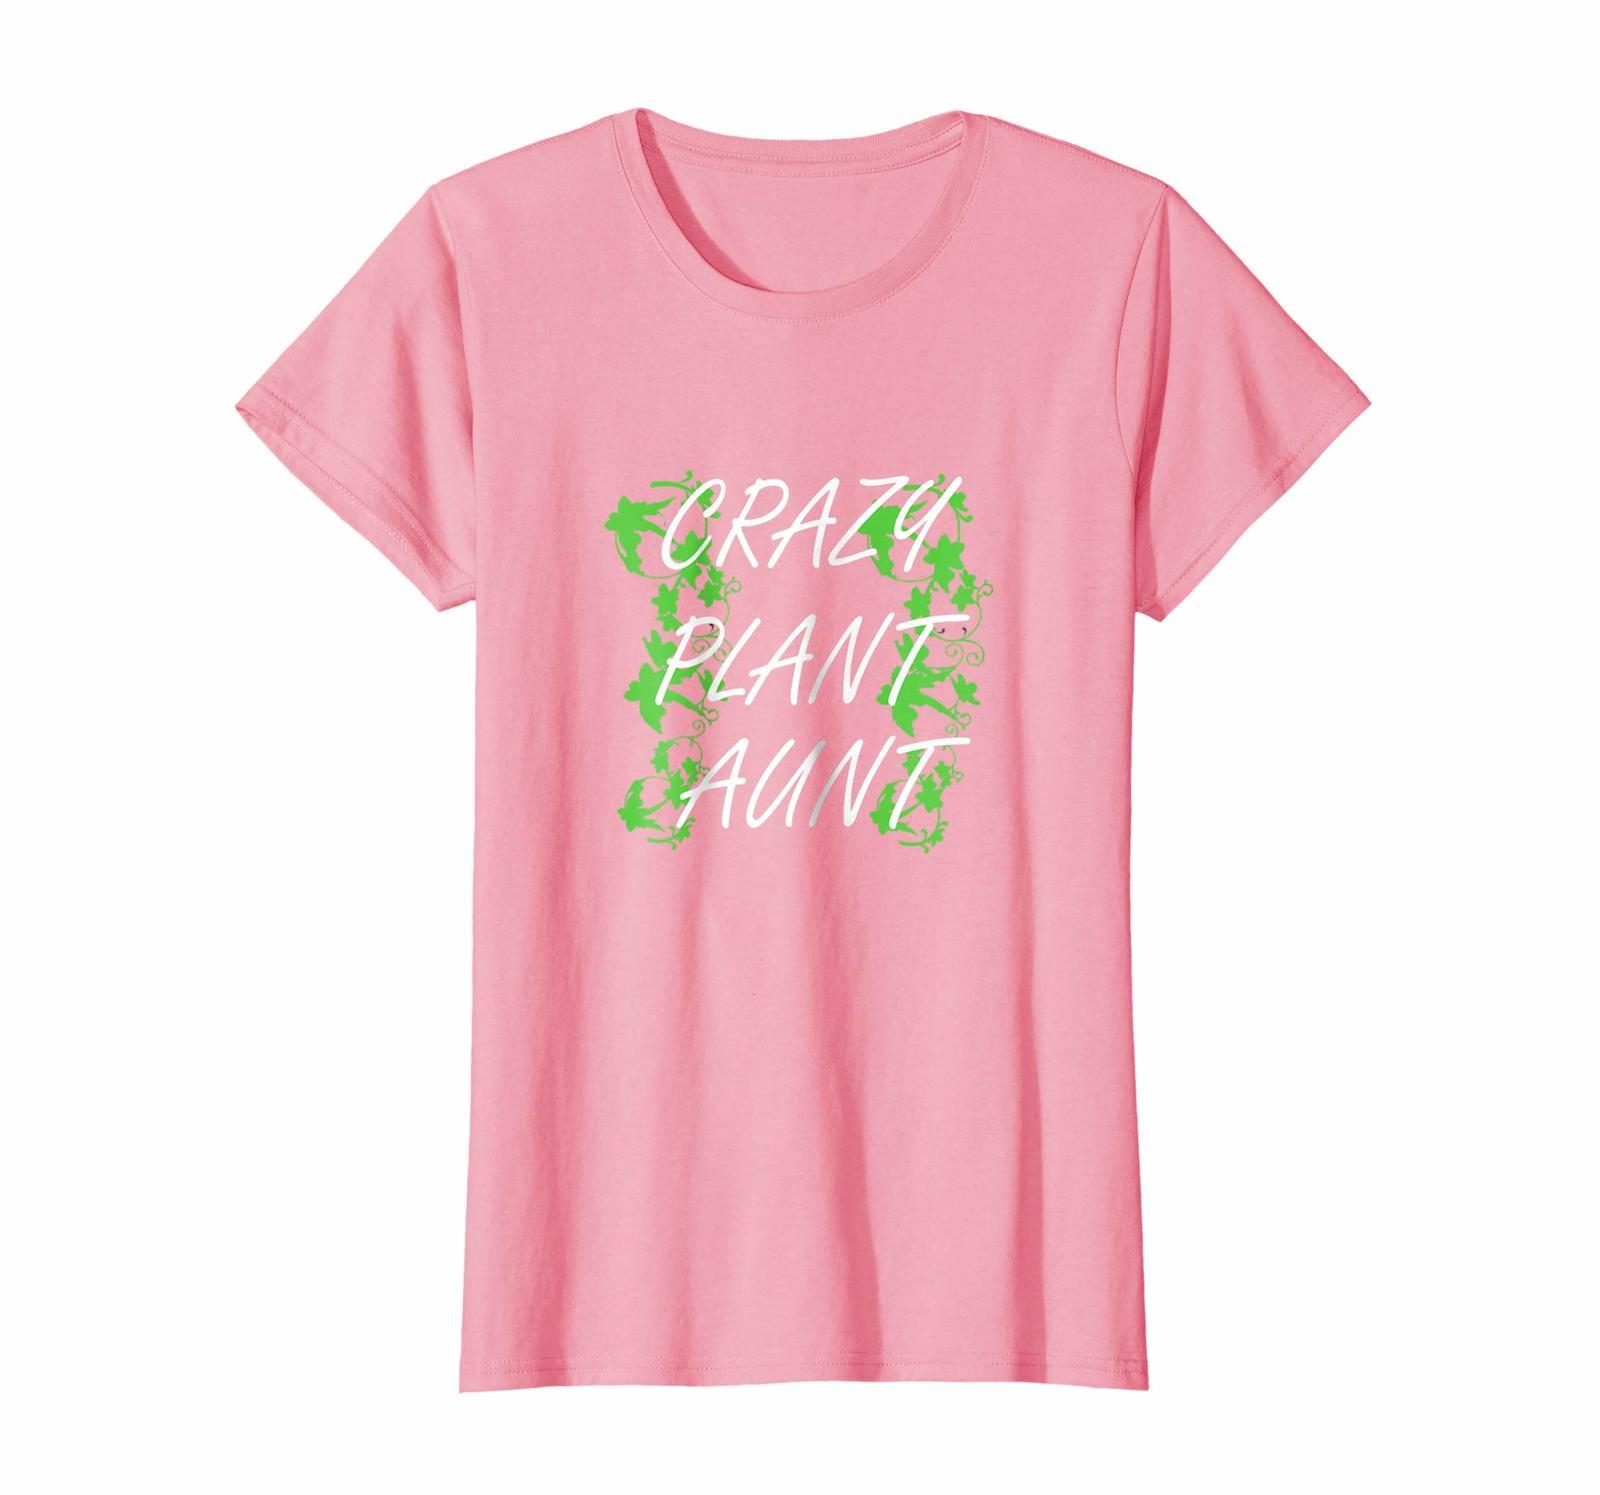 Amazing Shirt -  Crazy Plant Aunt Funny Gardening Shirt Spring Summer Gift Wowen